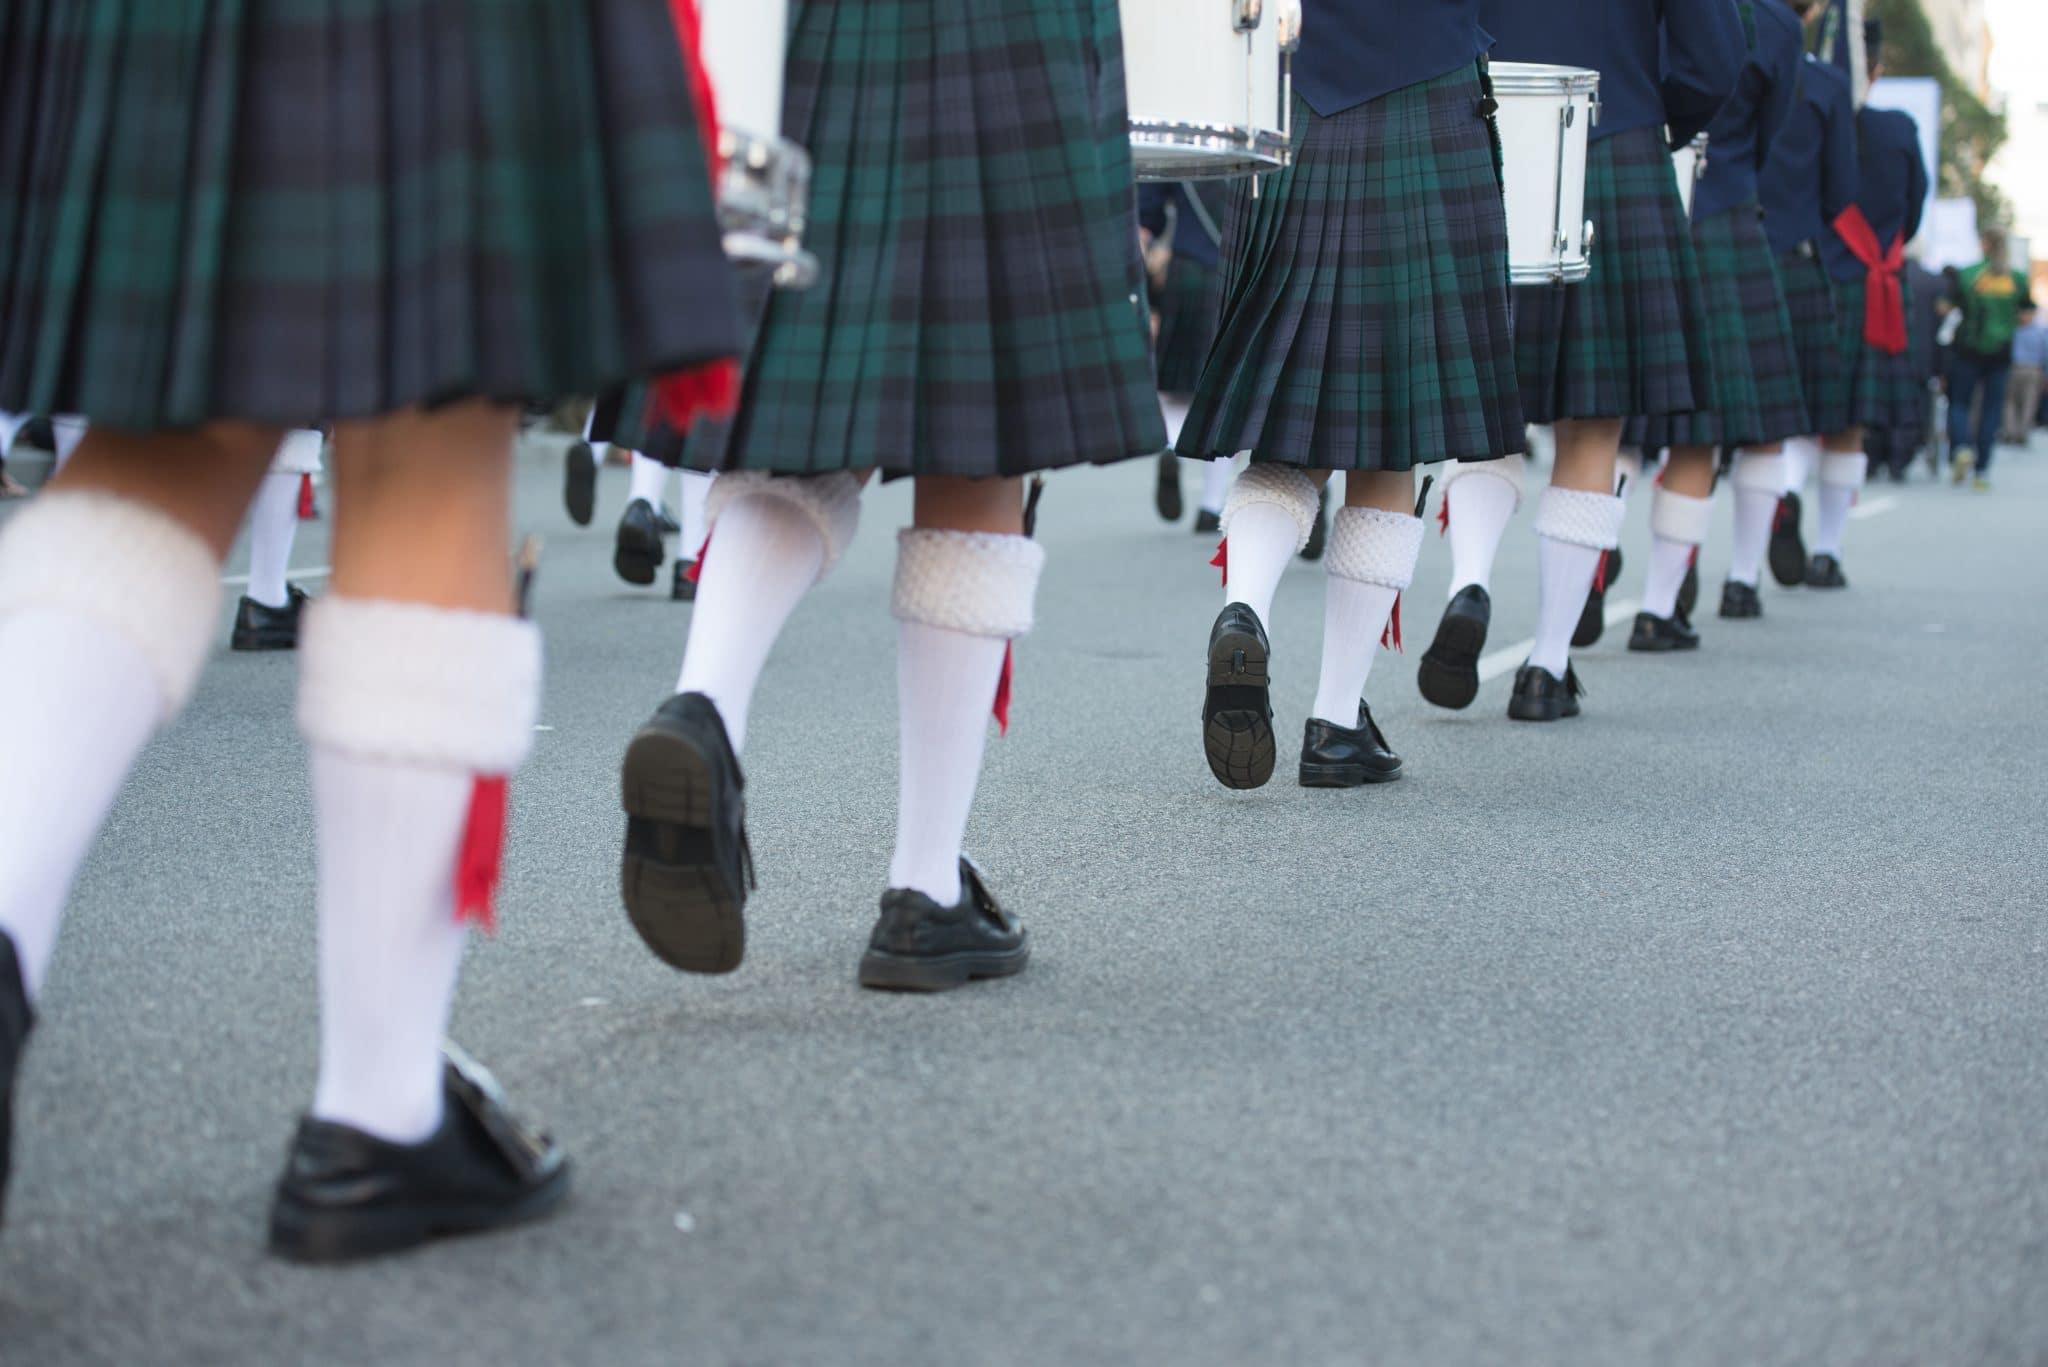 perth girls school - best high schools in perth - PLC